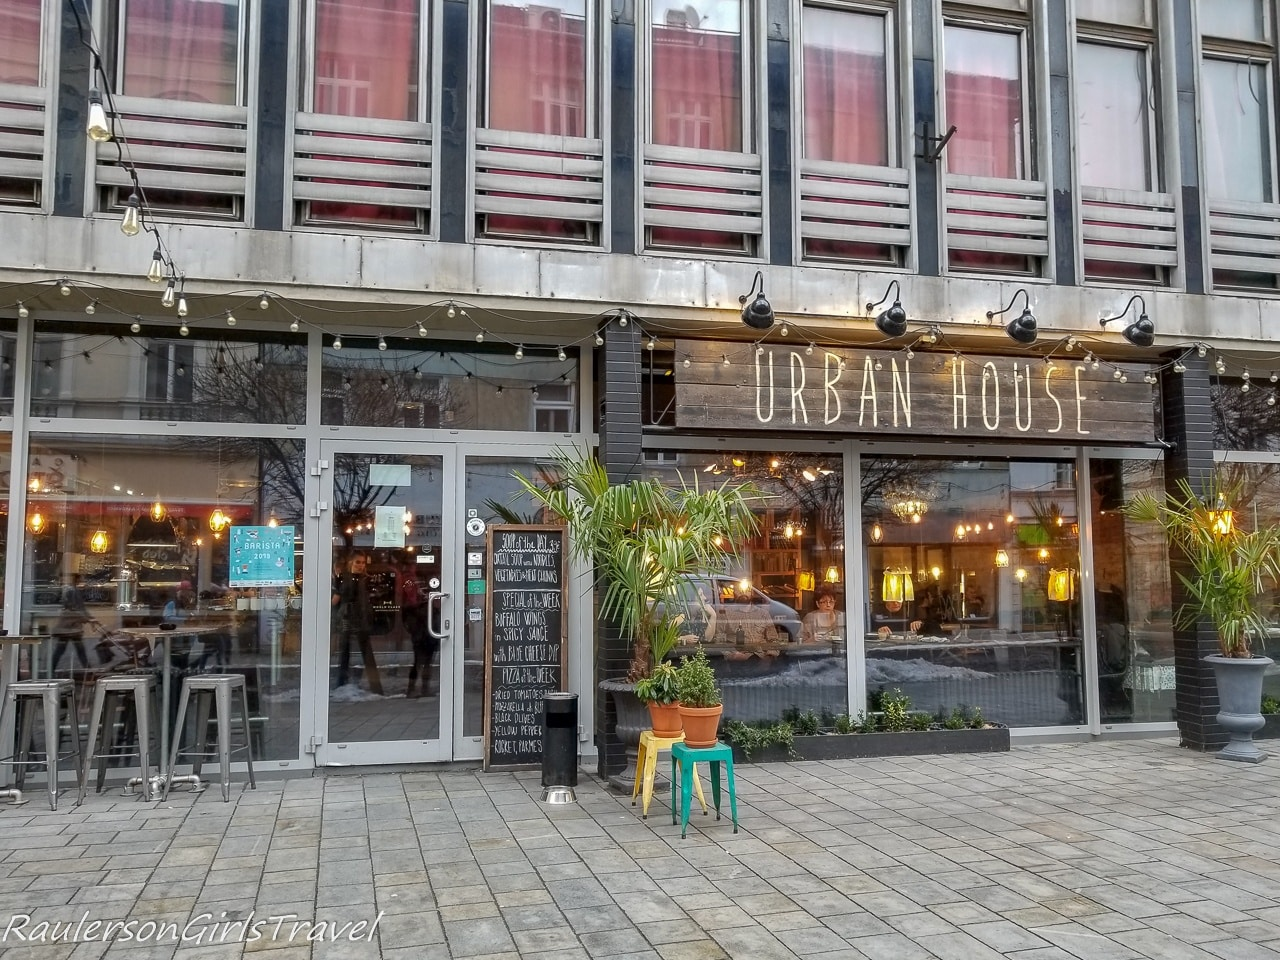 Urban House restaurant